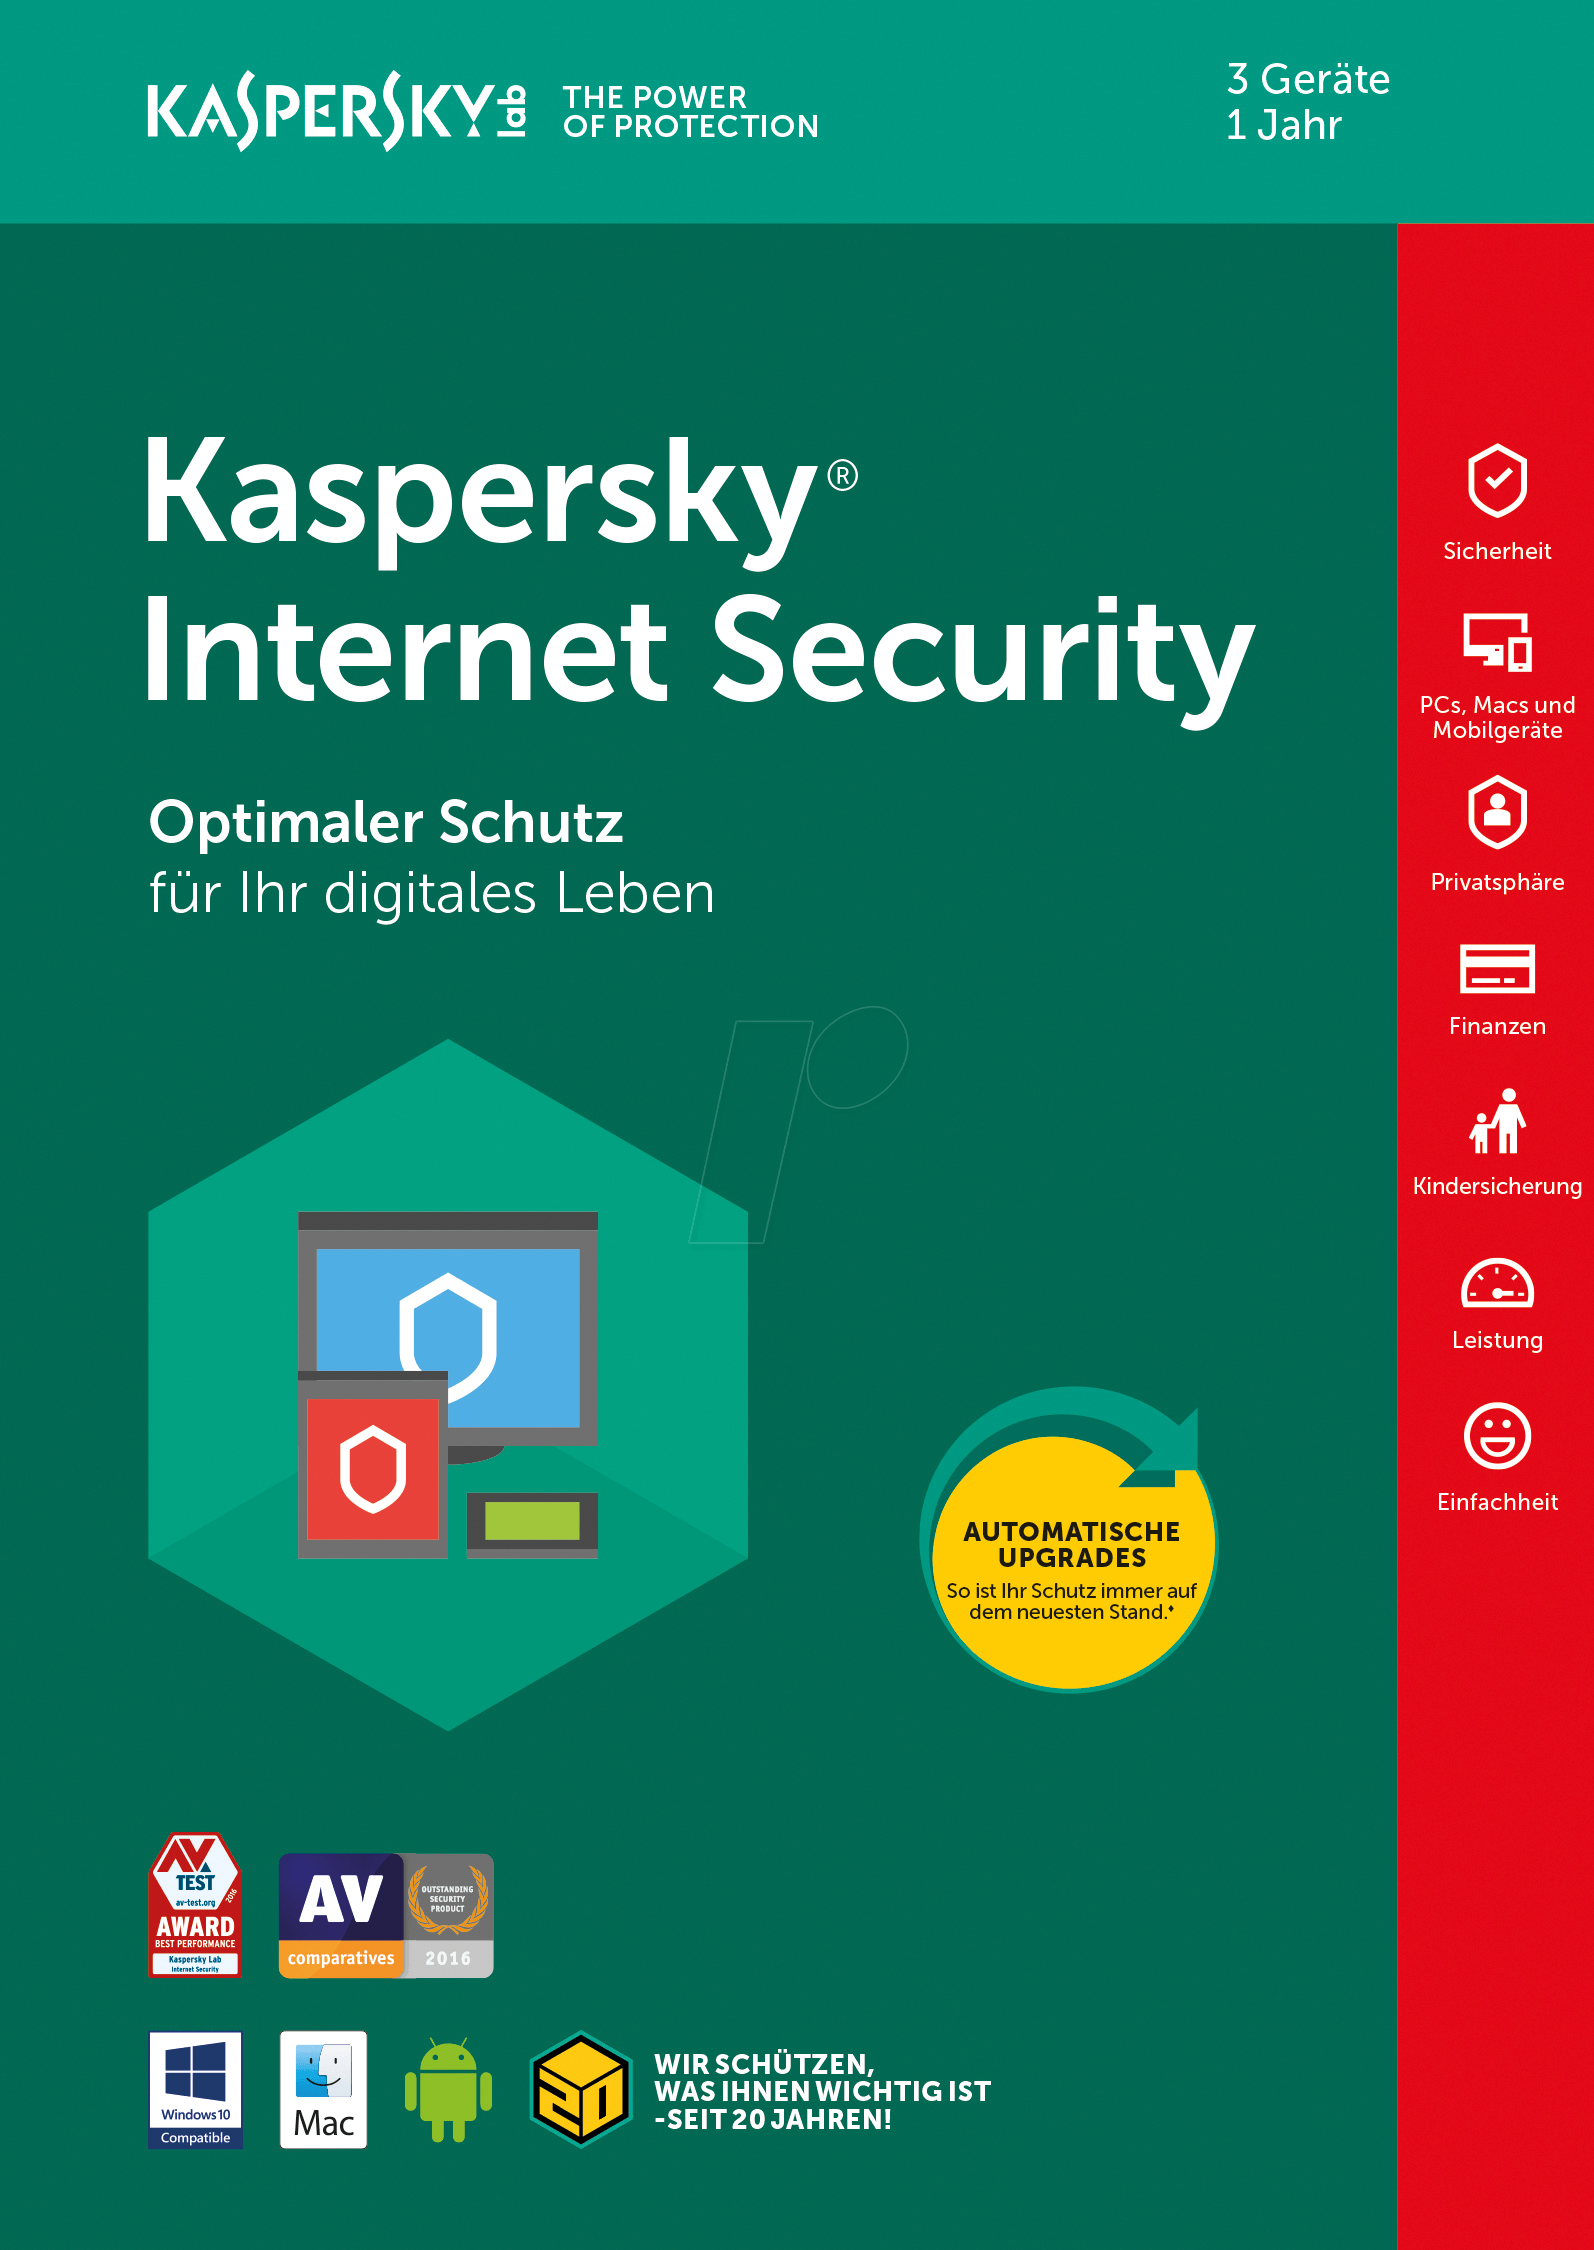 https://cdn-reichelt.de/bilder/web/xxl_ws/G500/KASPERSKY_IS2018_3U_01.png